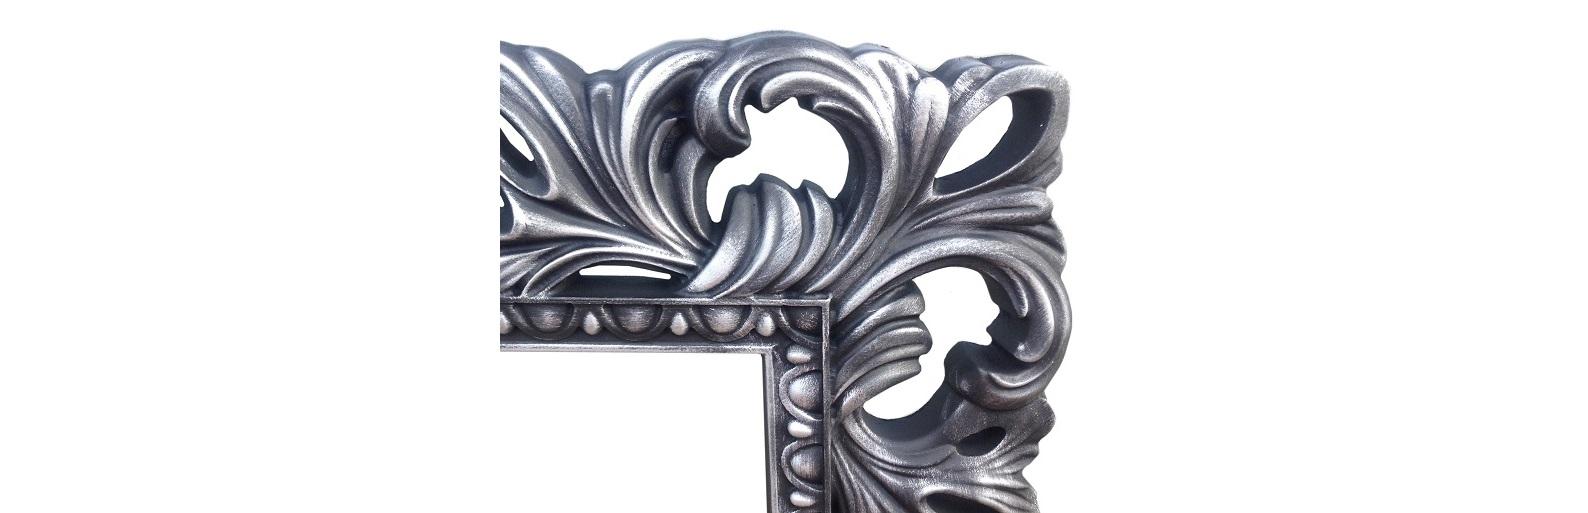 Красивое Винтажное зеркало от The Furnish